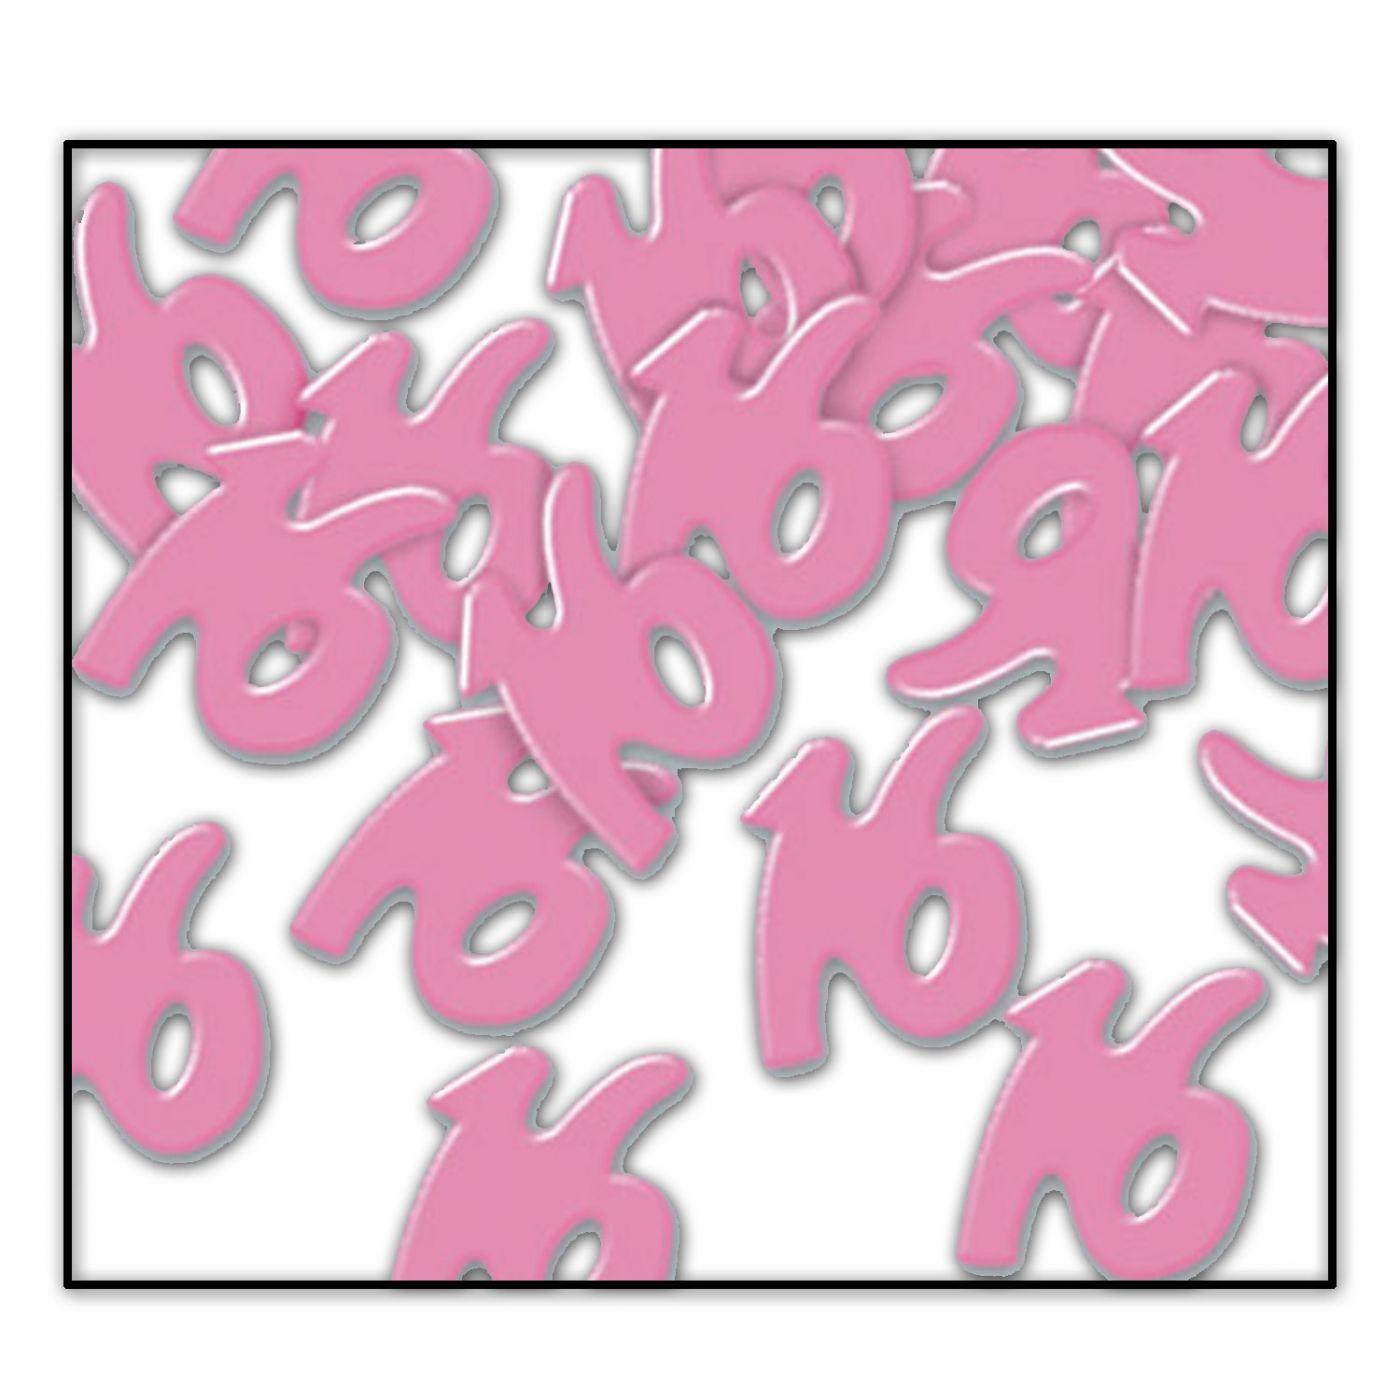 Fanci-Fetti  16  Silhouettes image